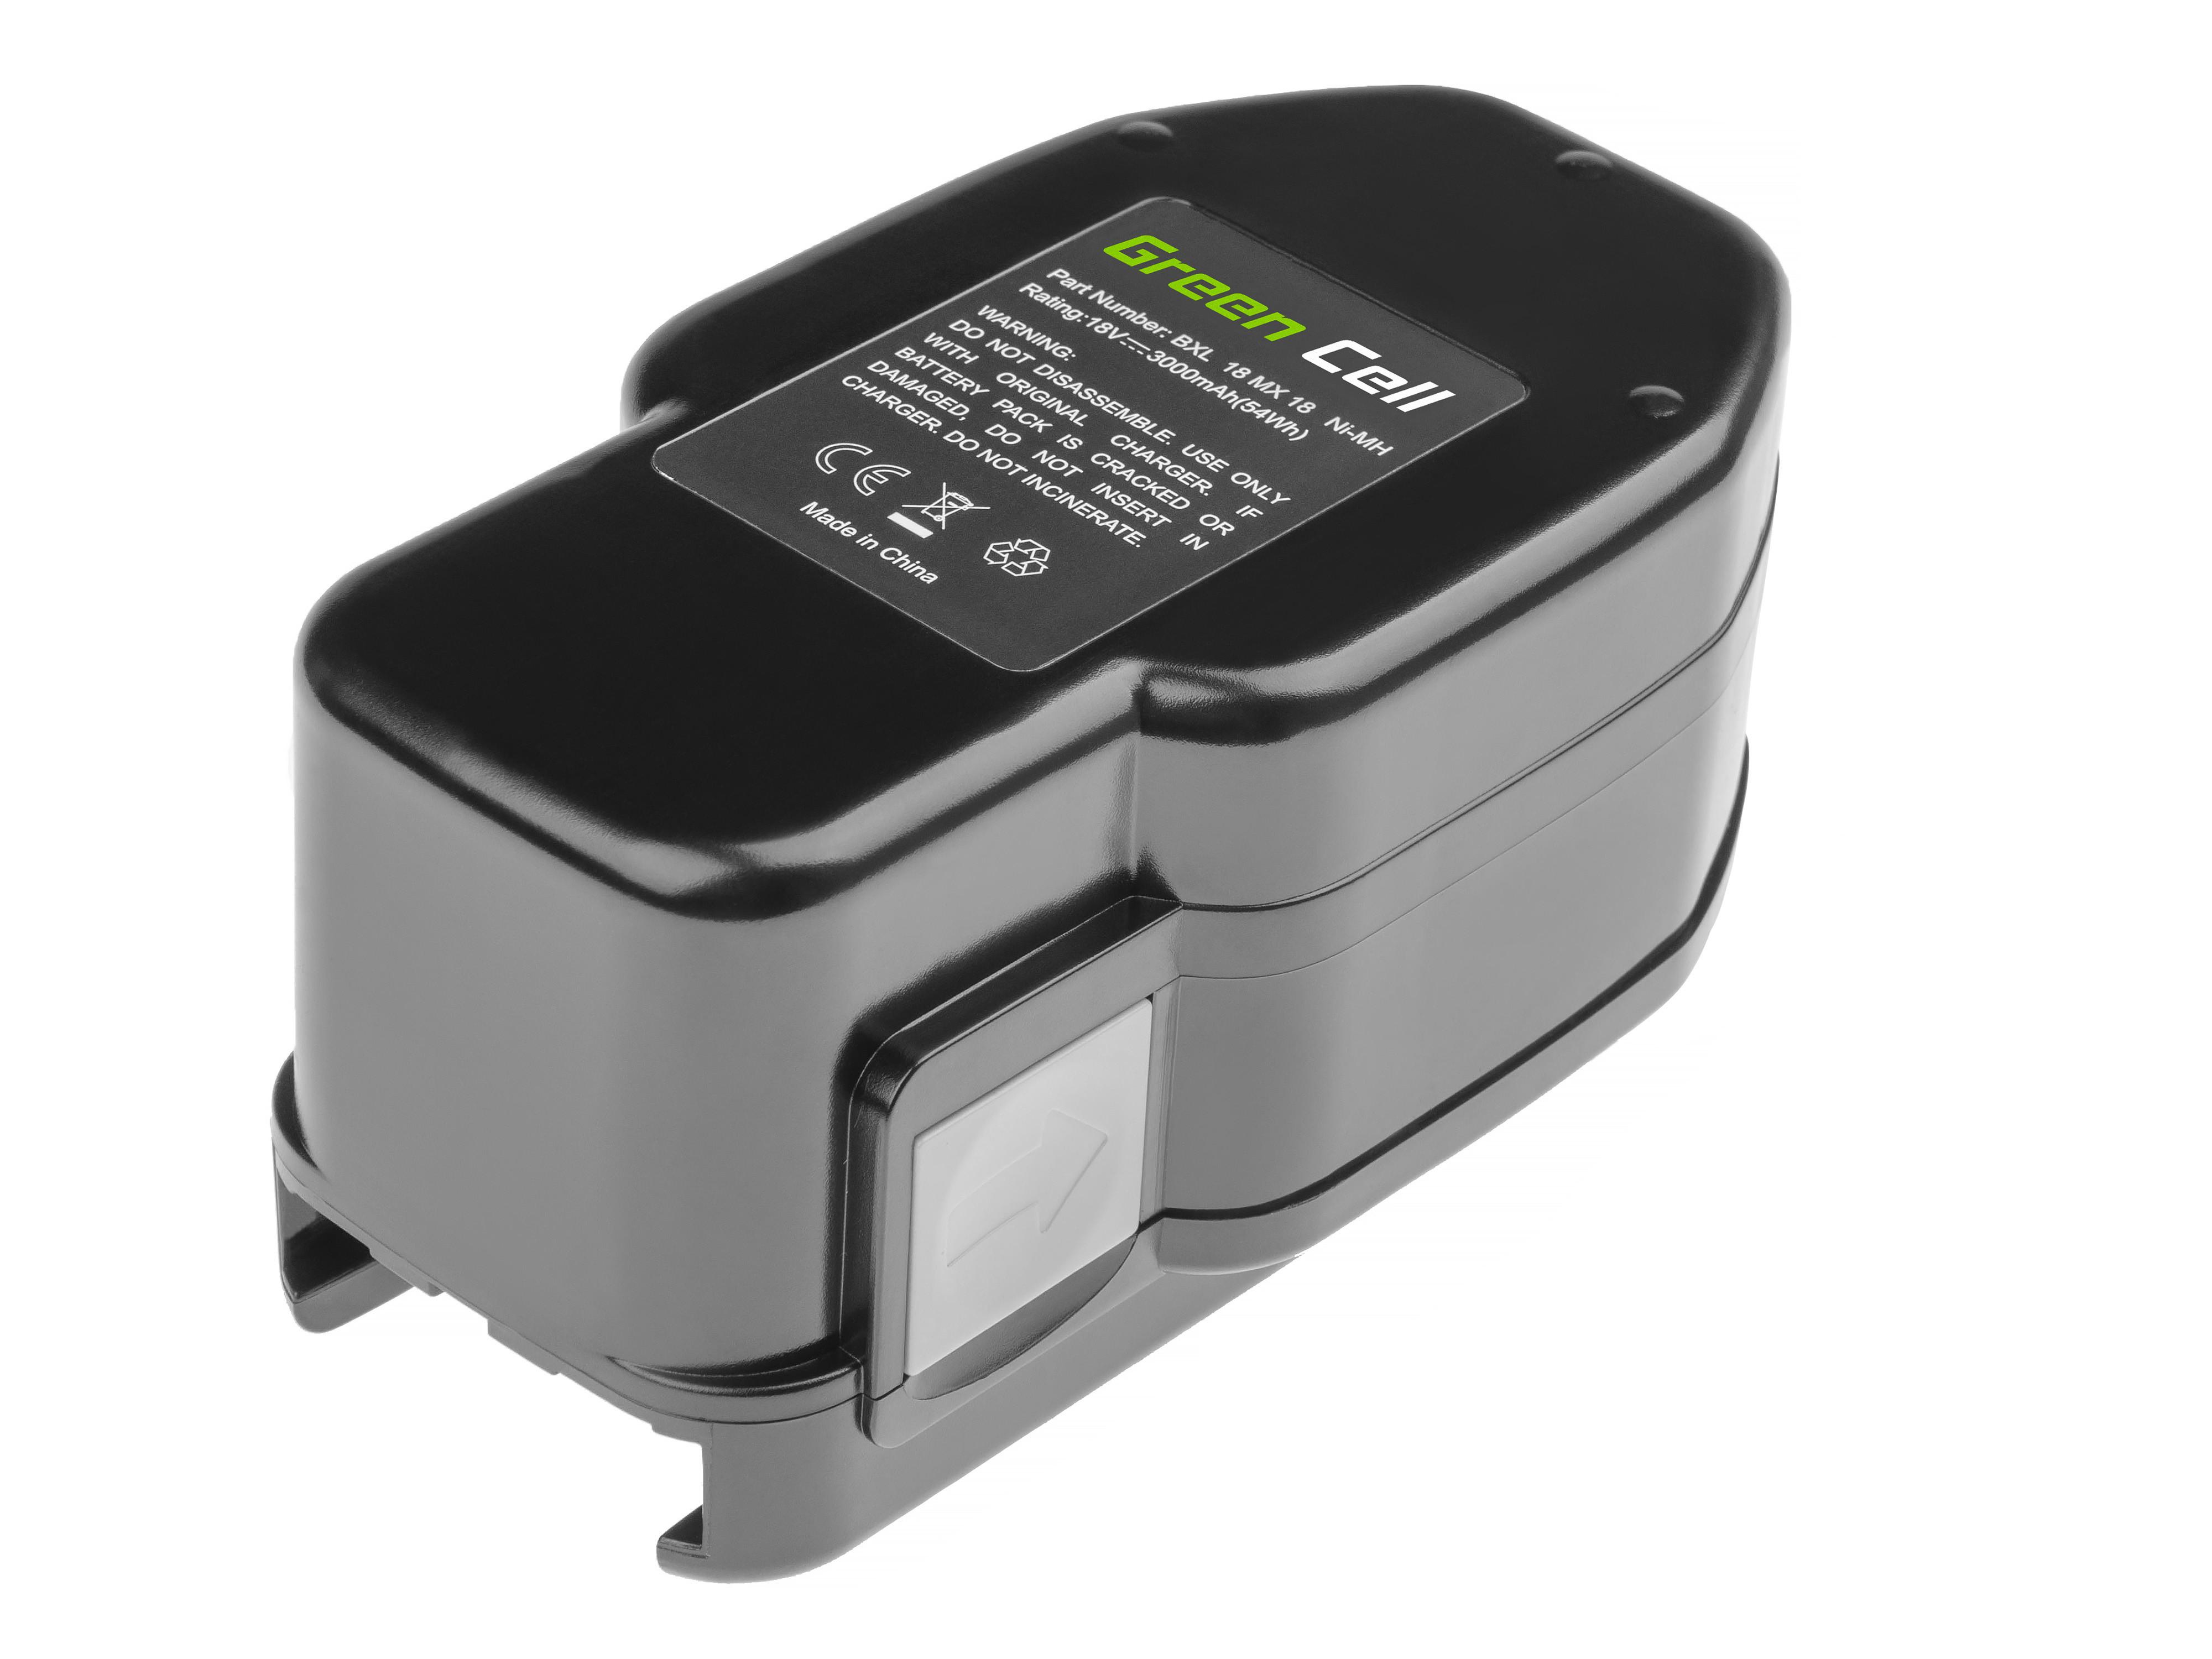 Baterie Green Cell Milwaukee 48-11-2320 PES PIW PSH PSX PWS 18 AEG B18 BBM BDSE BXL BSX 18 18V 3000mAh Ni-MH – neoriginální